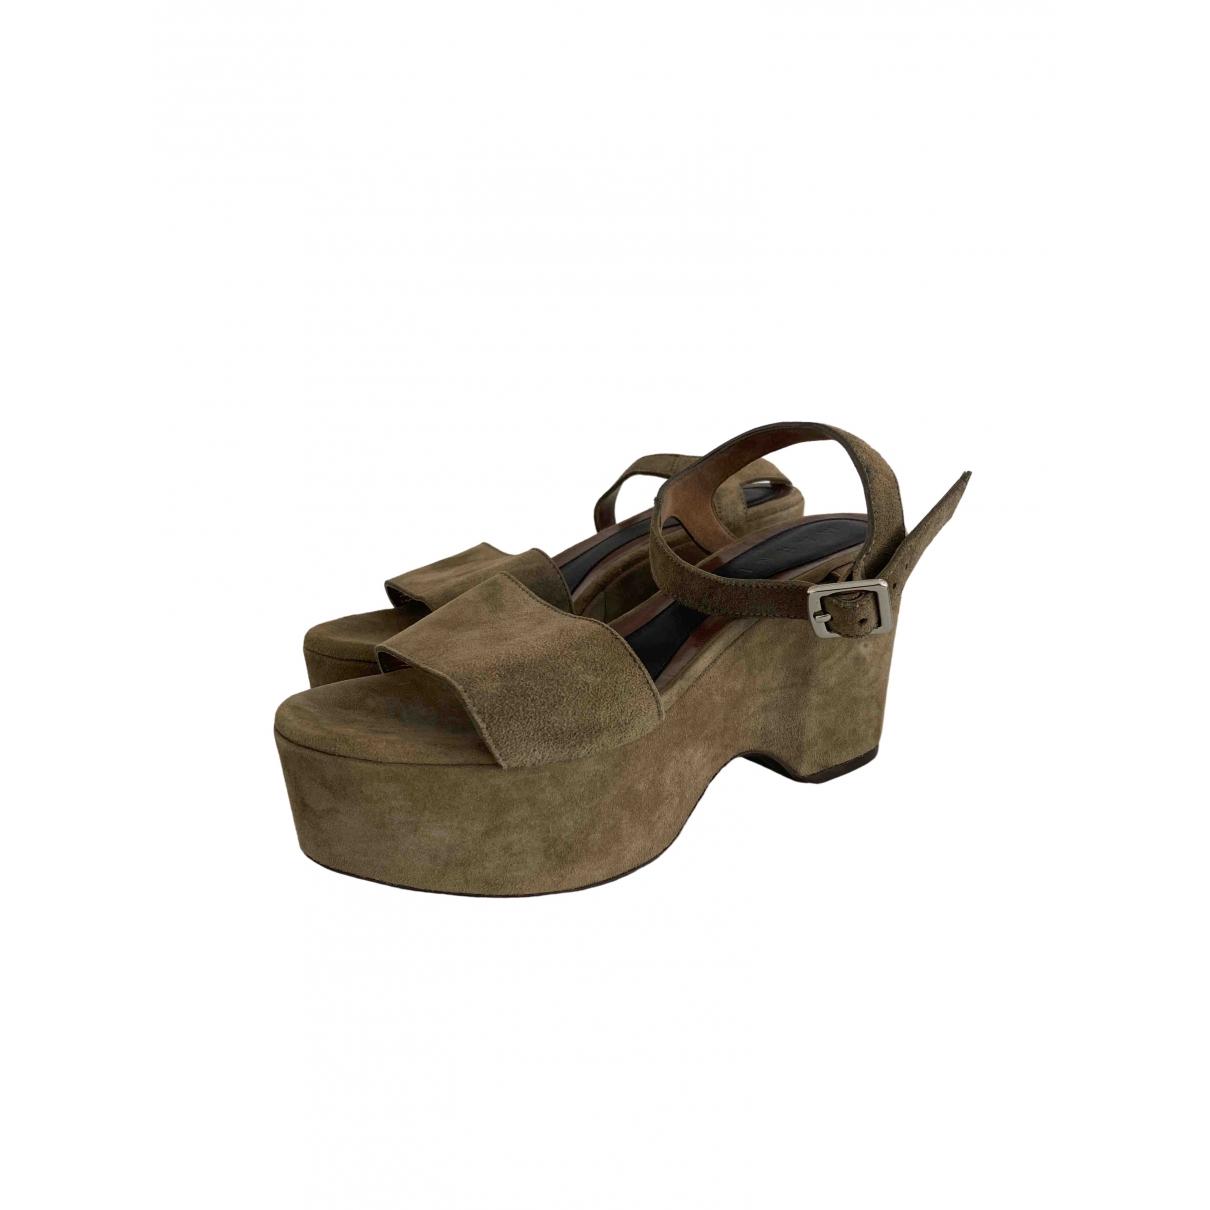 Marni \N Beige Suede Sandals for Women 39 EU